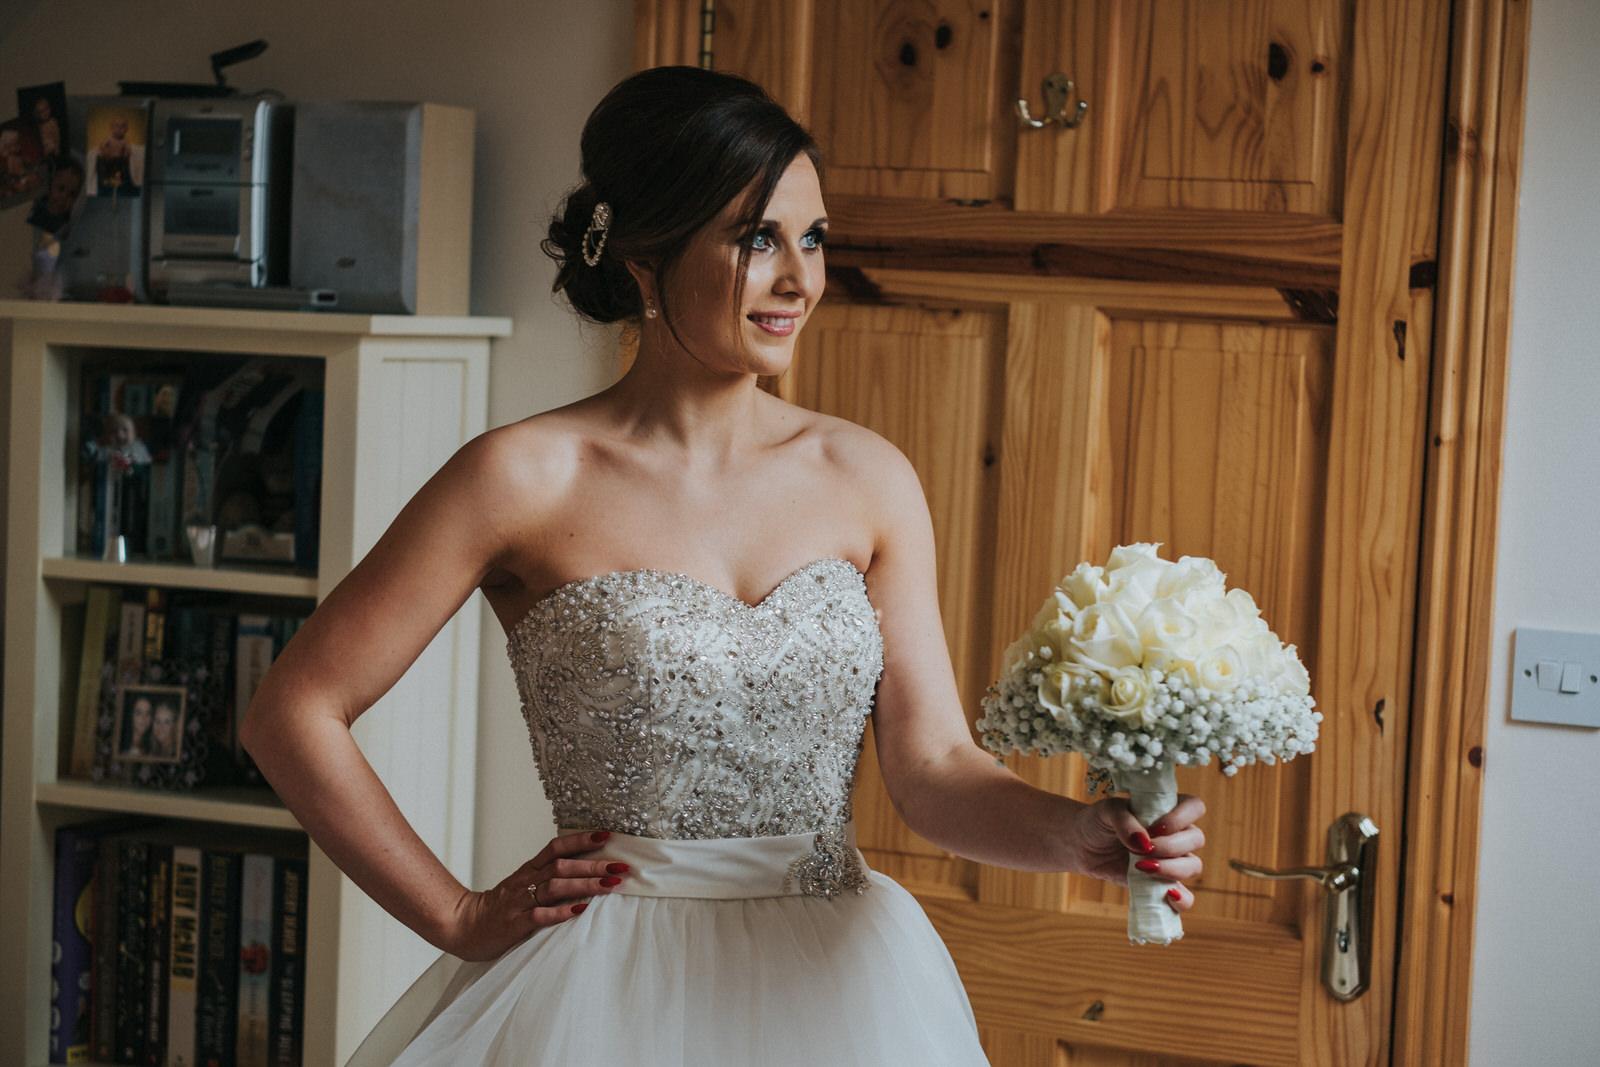 Clonabreany_wedding-photographer_roger_kenny_ireland_020.jpg